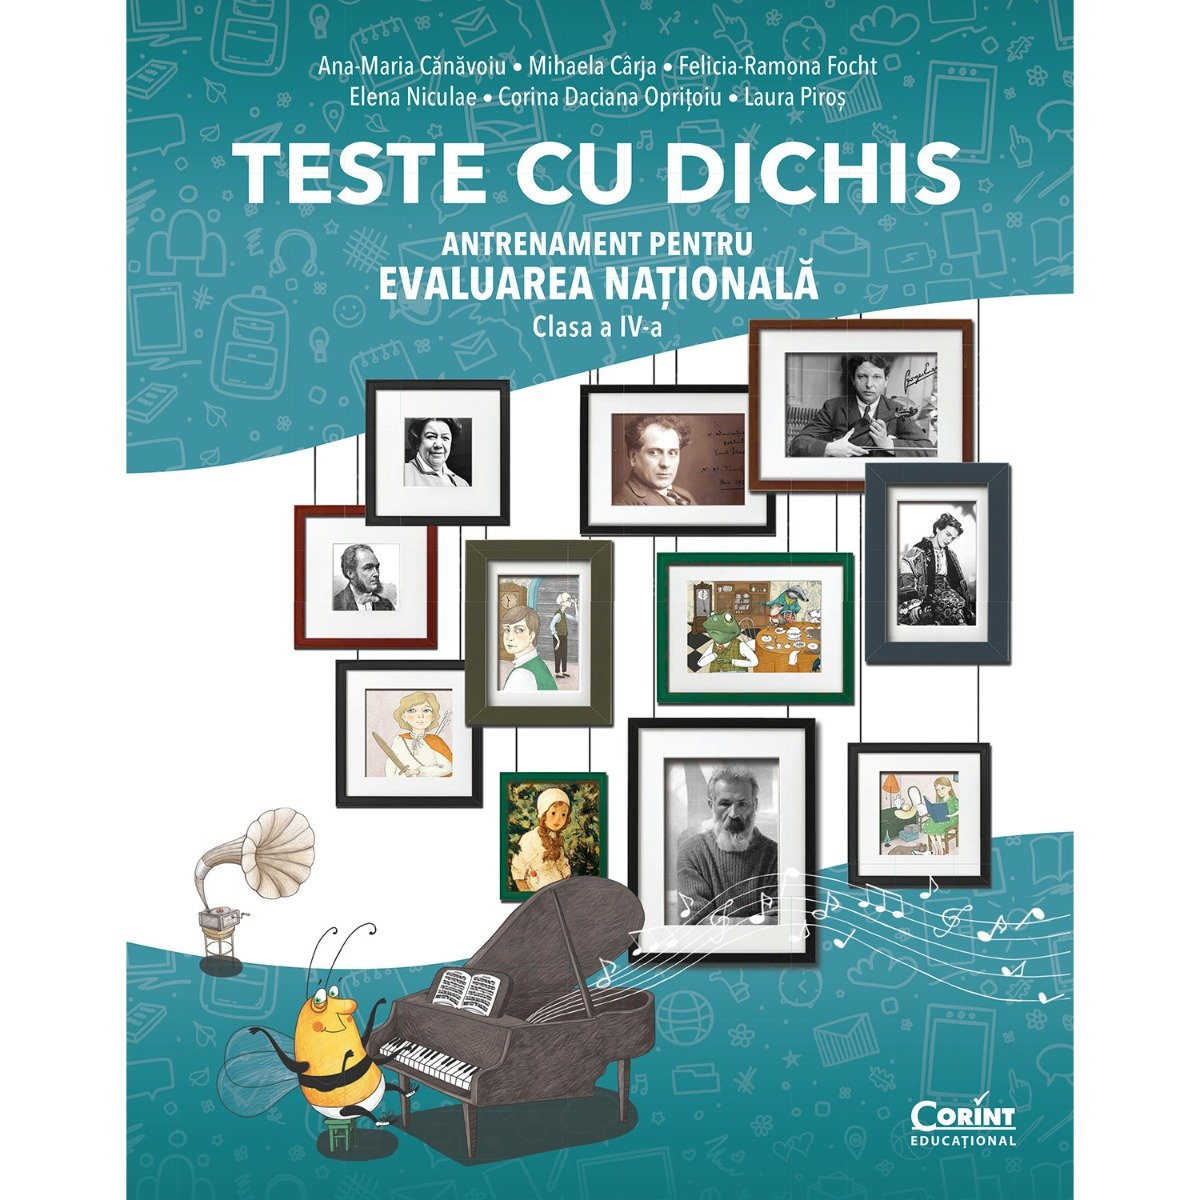 Teste cu dichis, Antrenament pentru evaluarea nationala, Clasa a IV-a, Ana-Maria Canavoiu